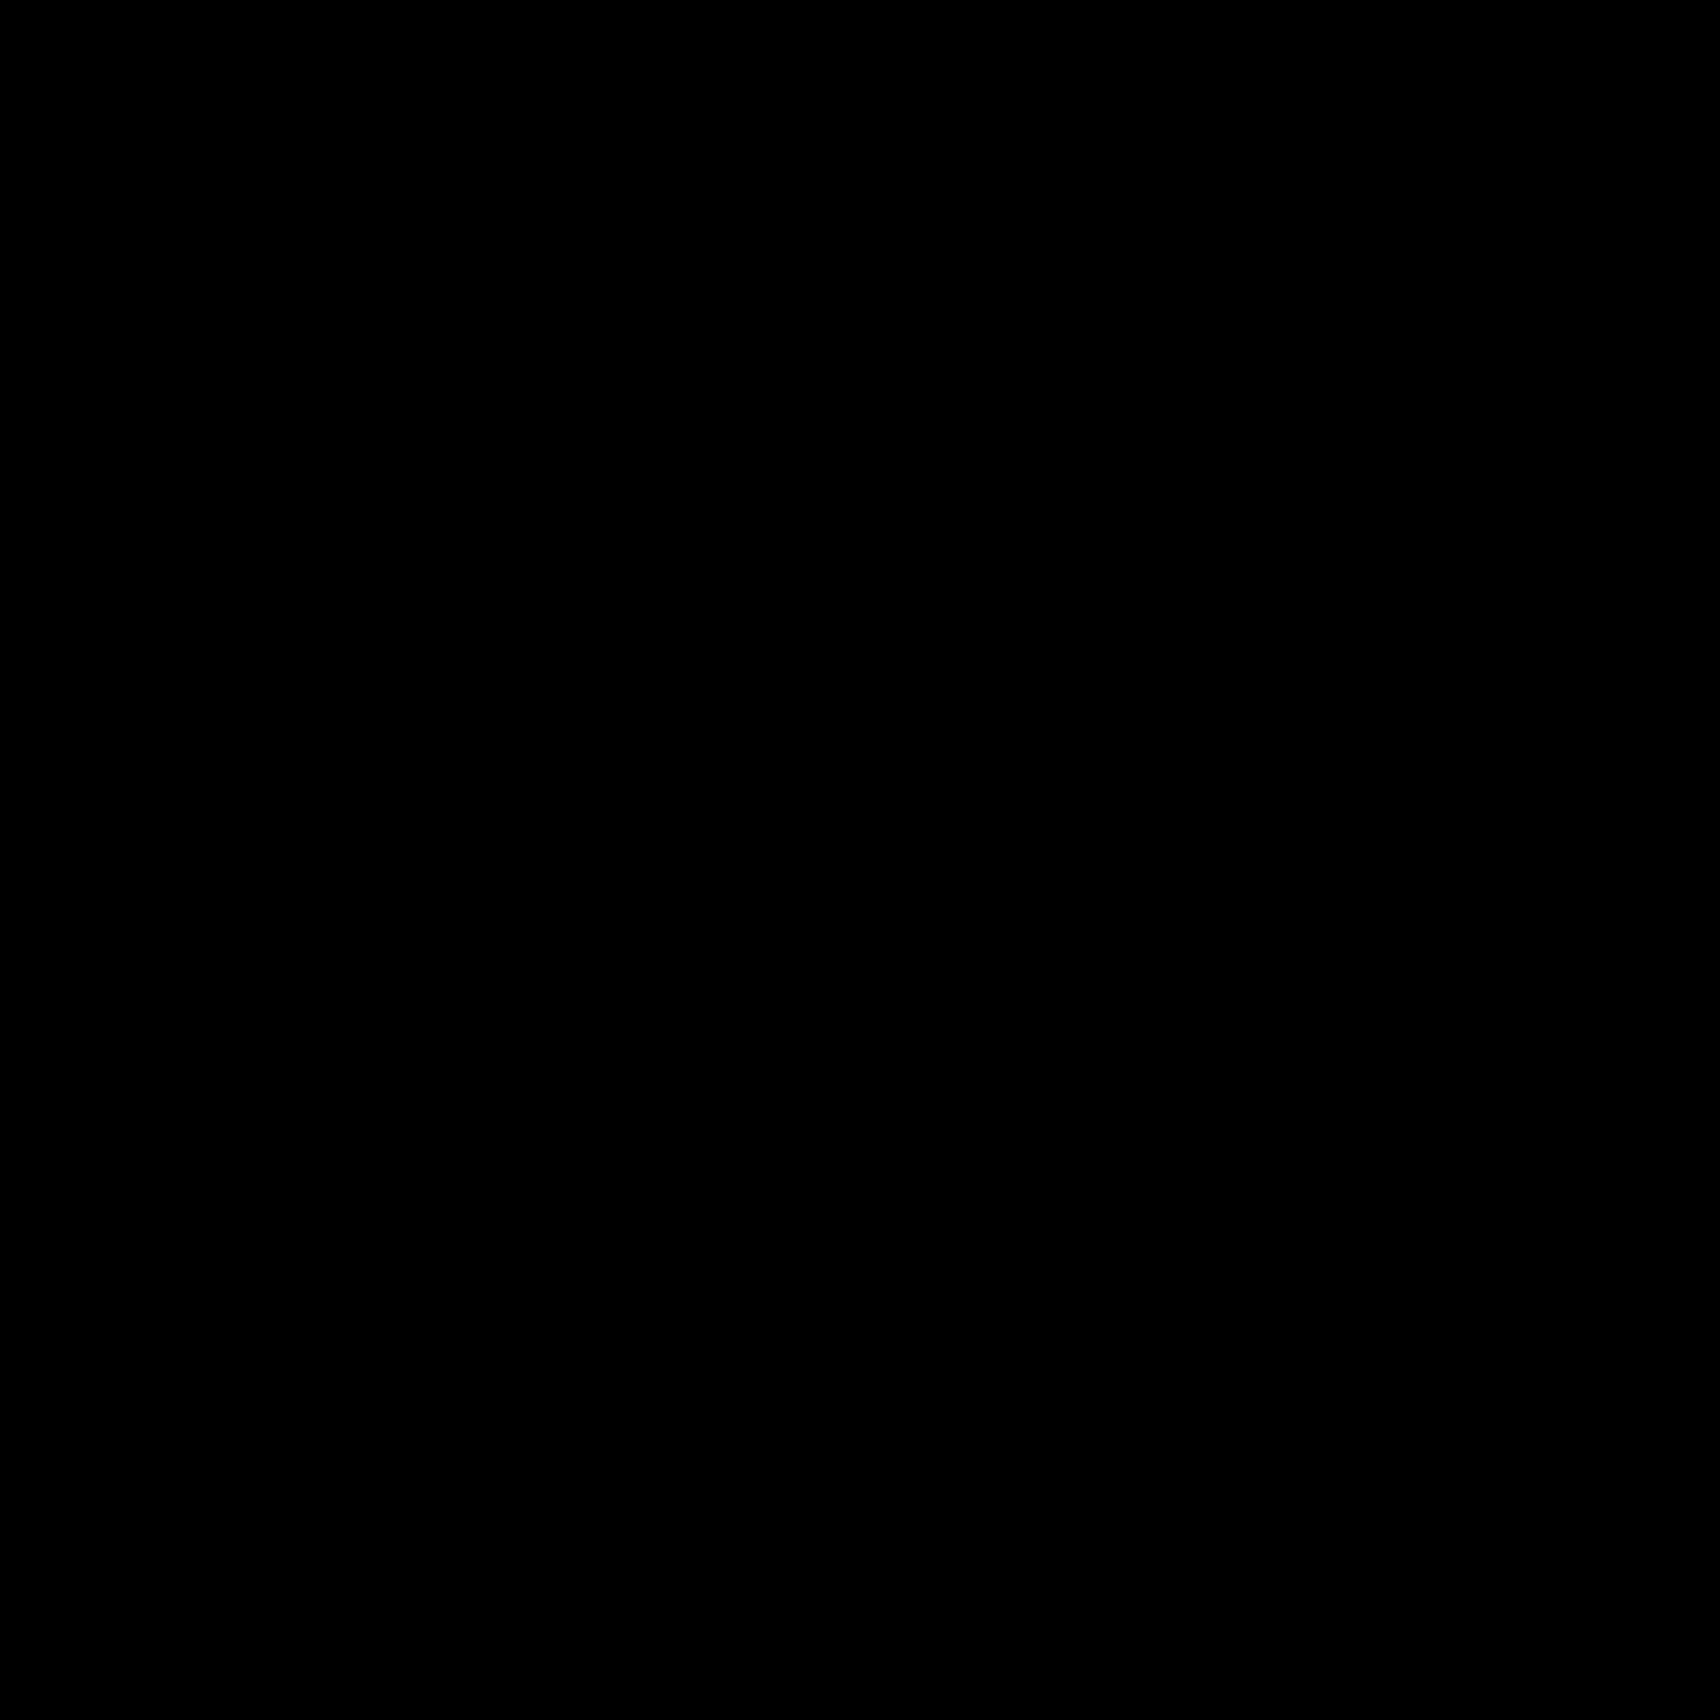 zudin-headshot